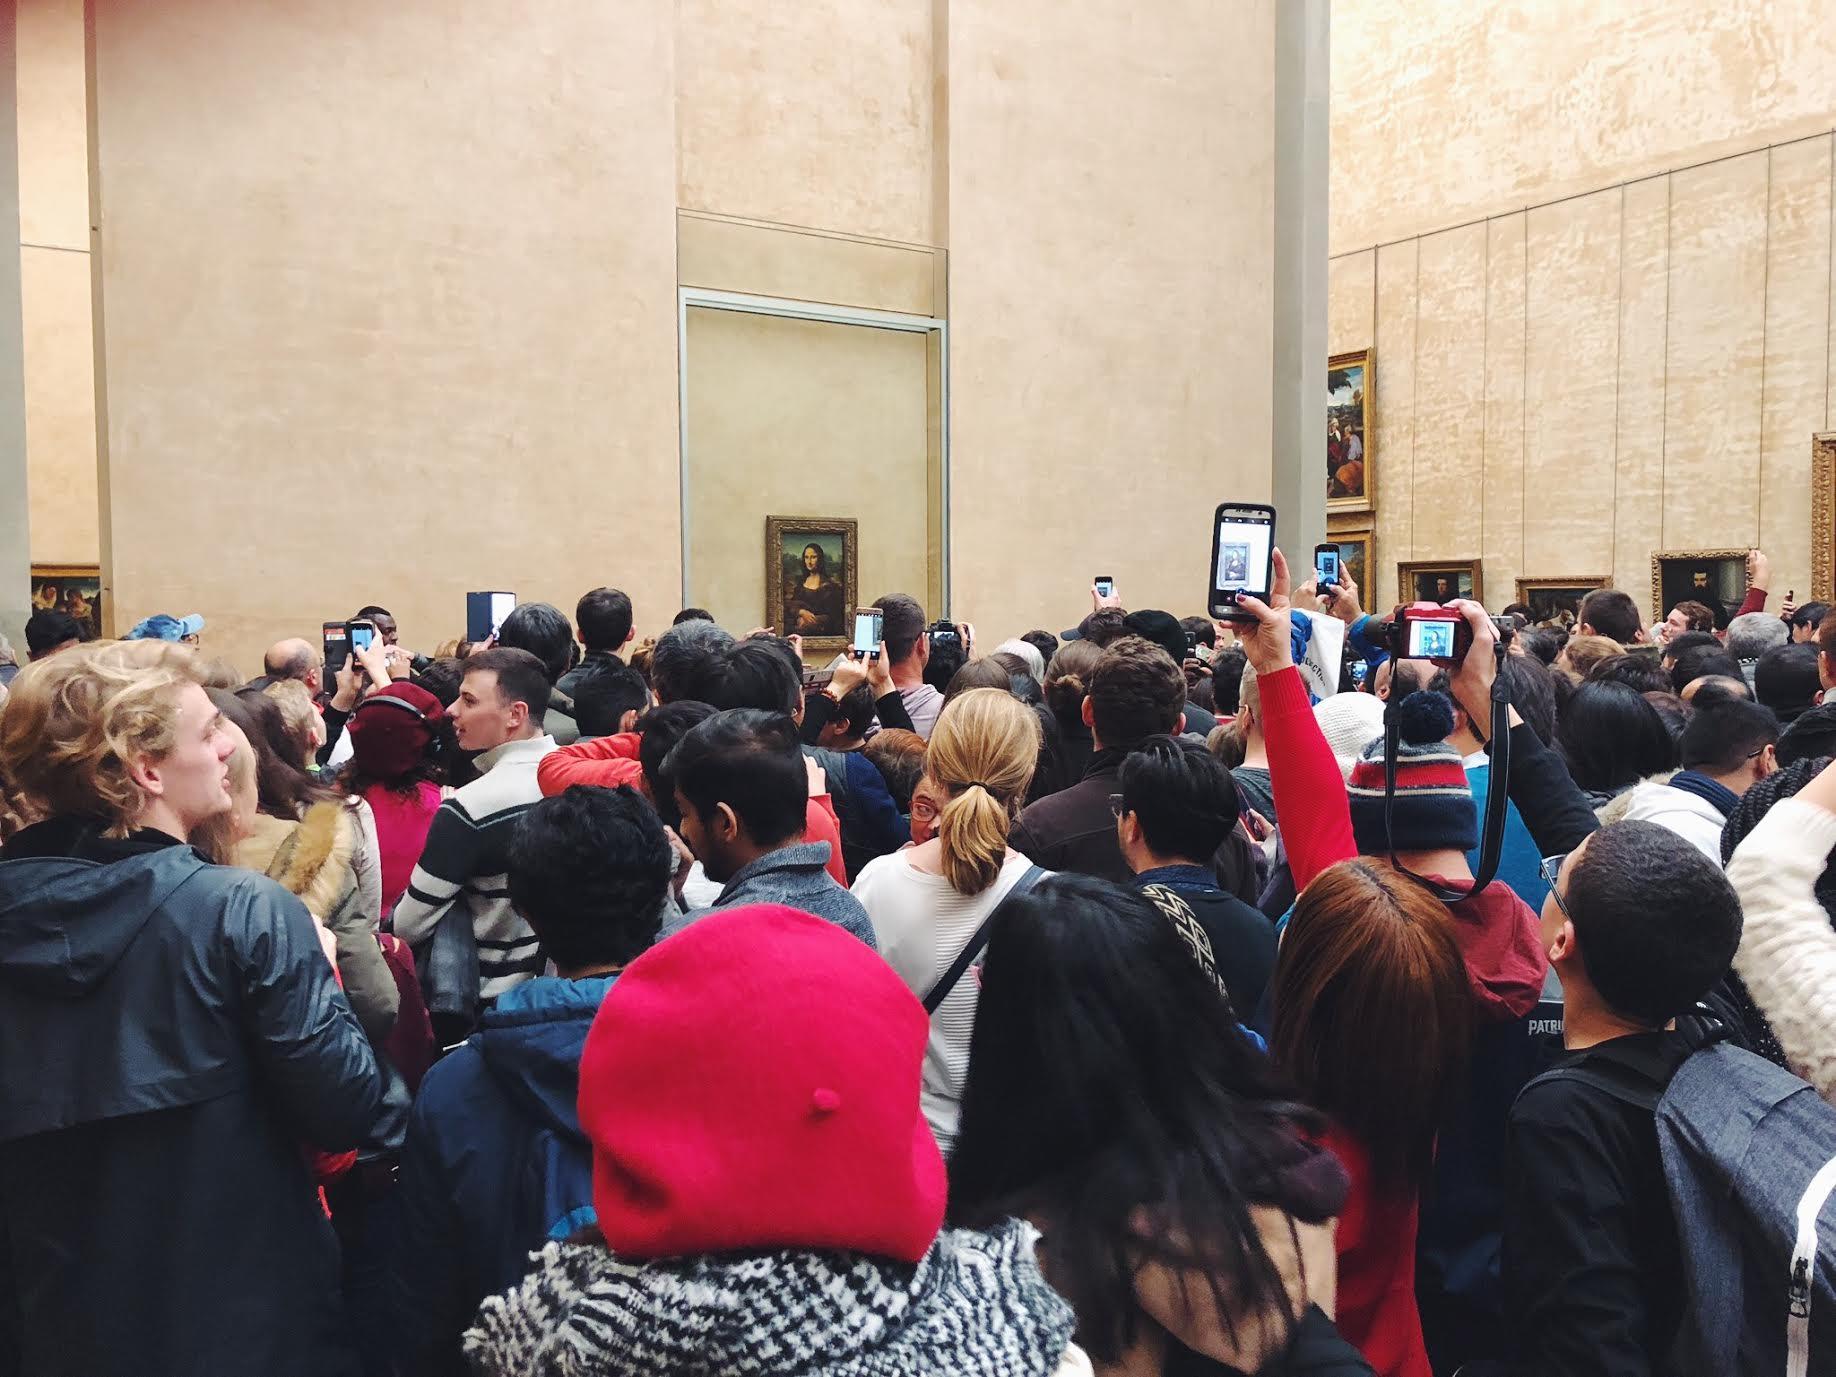 Muslim-travel-guide-Paris-Mona-Lisa-crowd.jpg